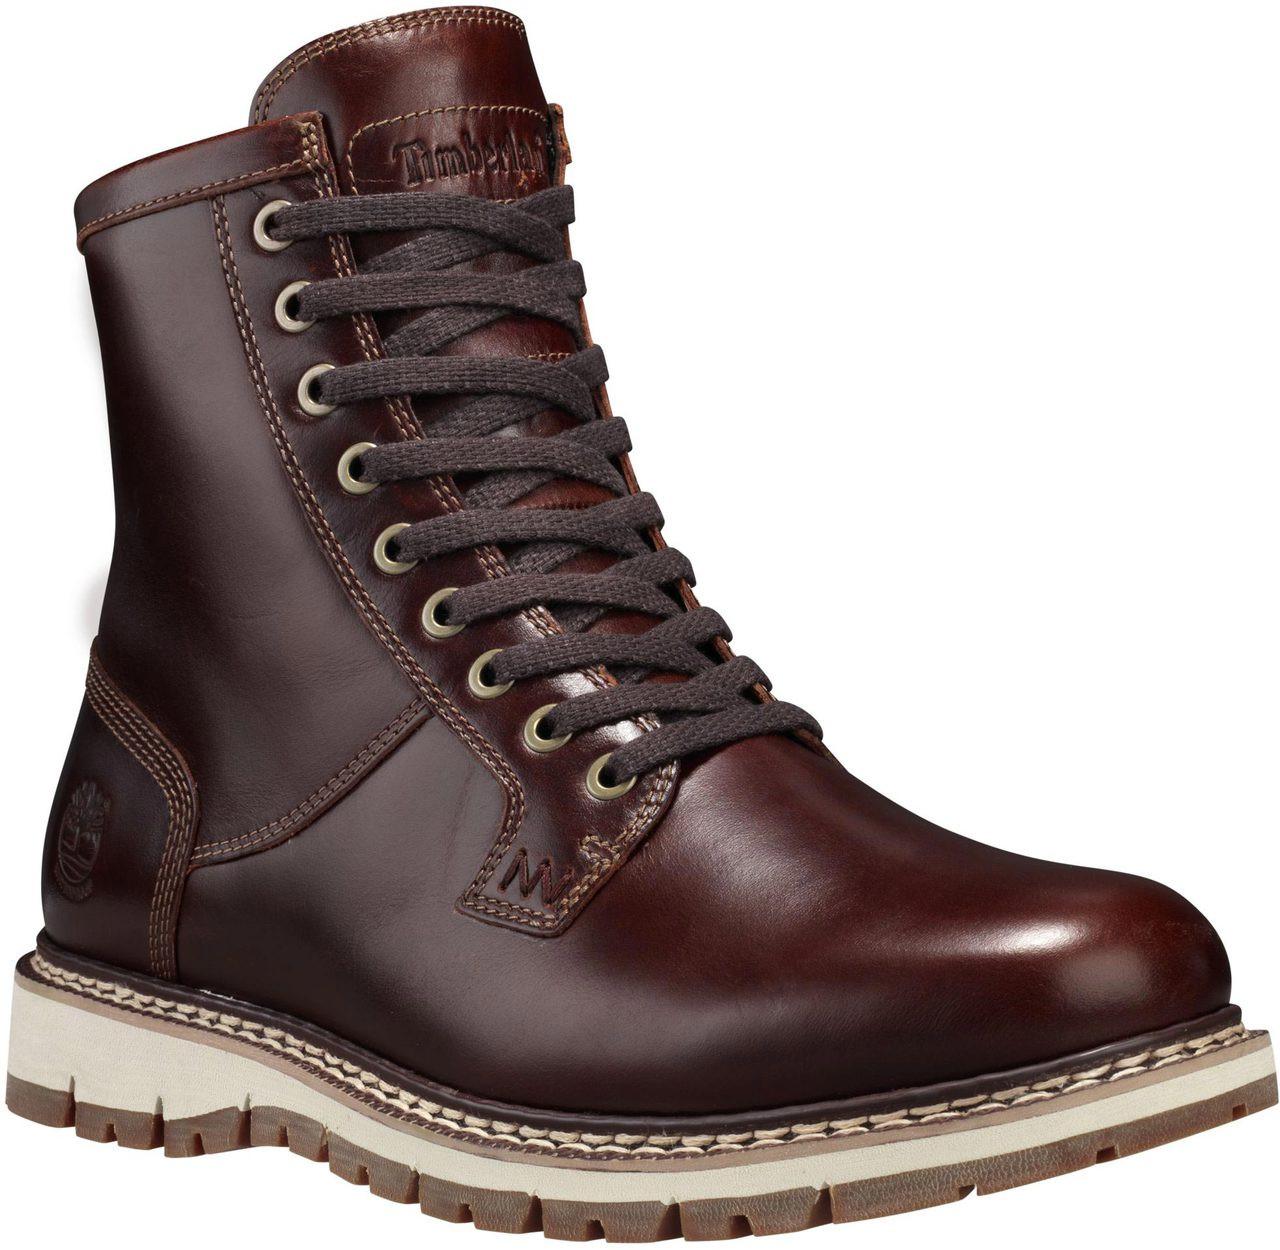 ... Casual Boots; Timberland Men's Britton Hill Plain-Toe. Burnt Orange  Full-Grain · Burnt Orange Full-Grain · Dark Brown Full-Grain